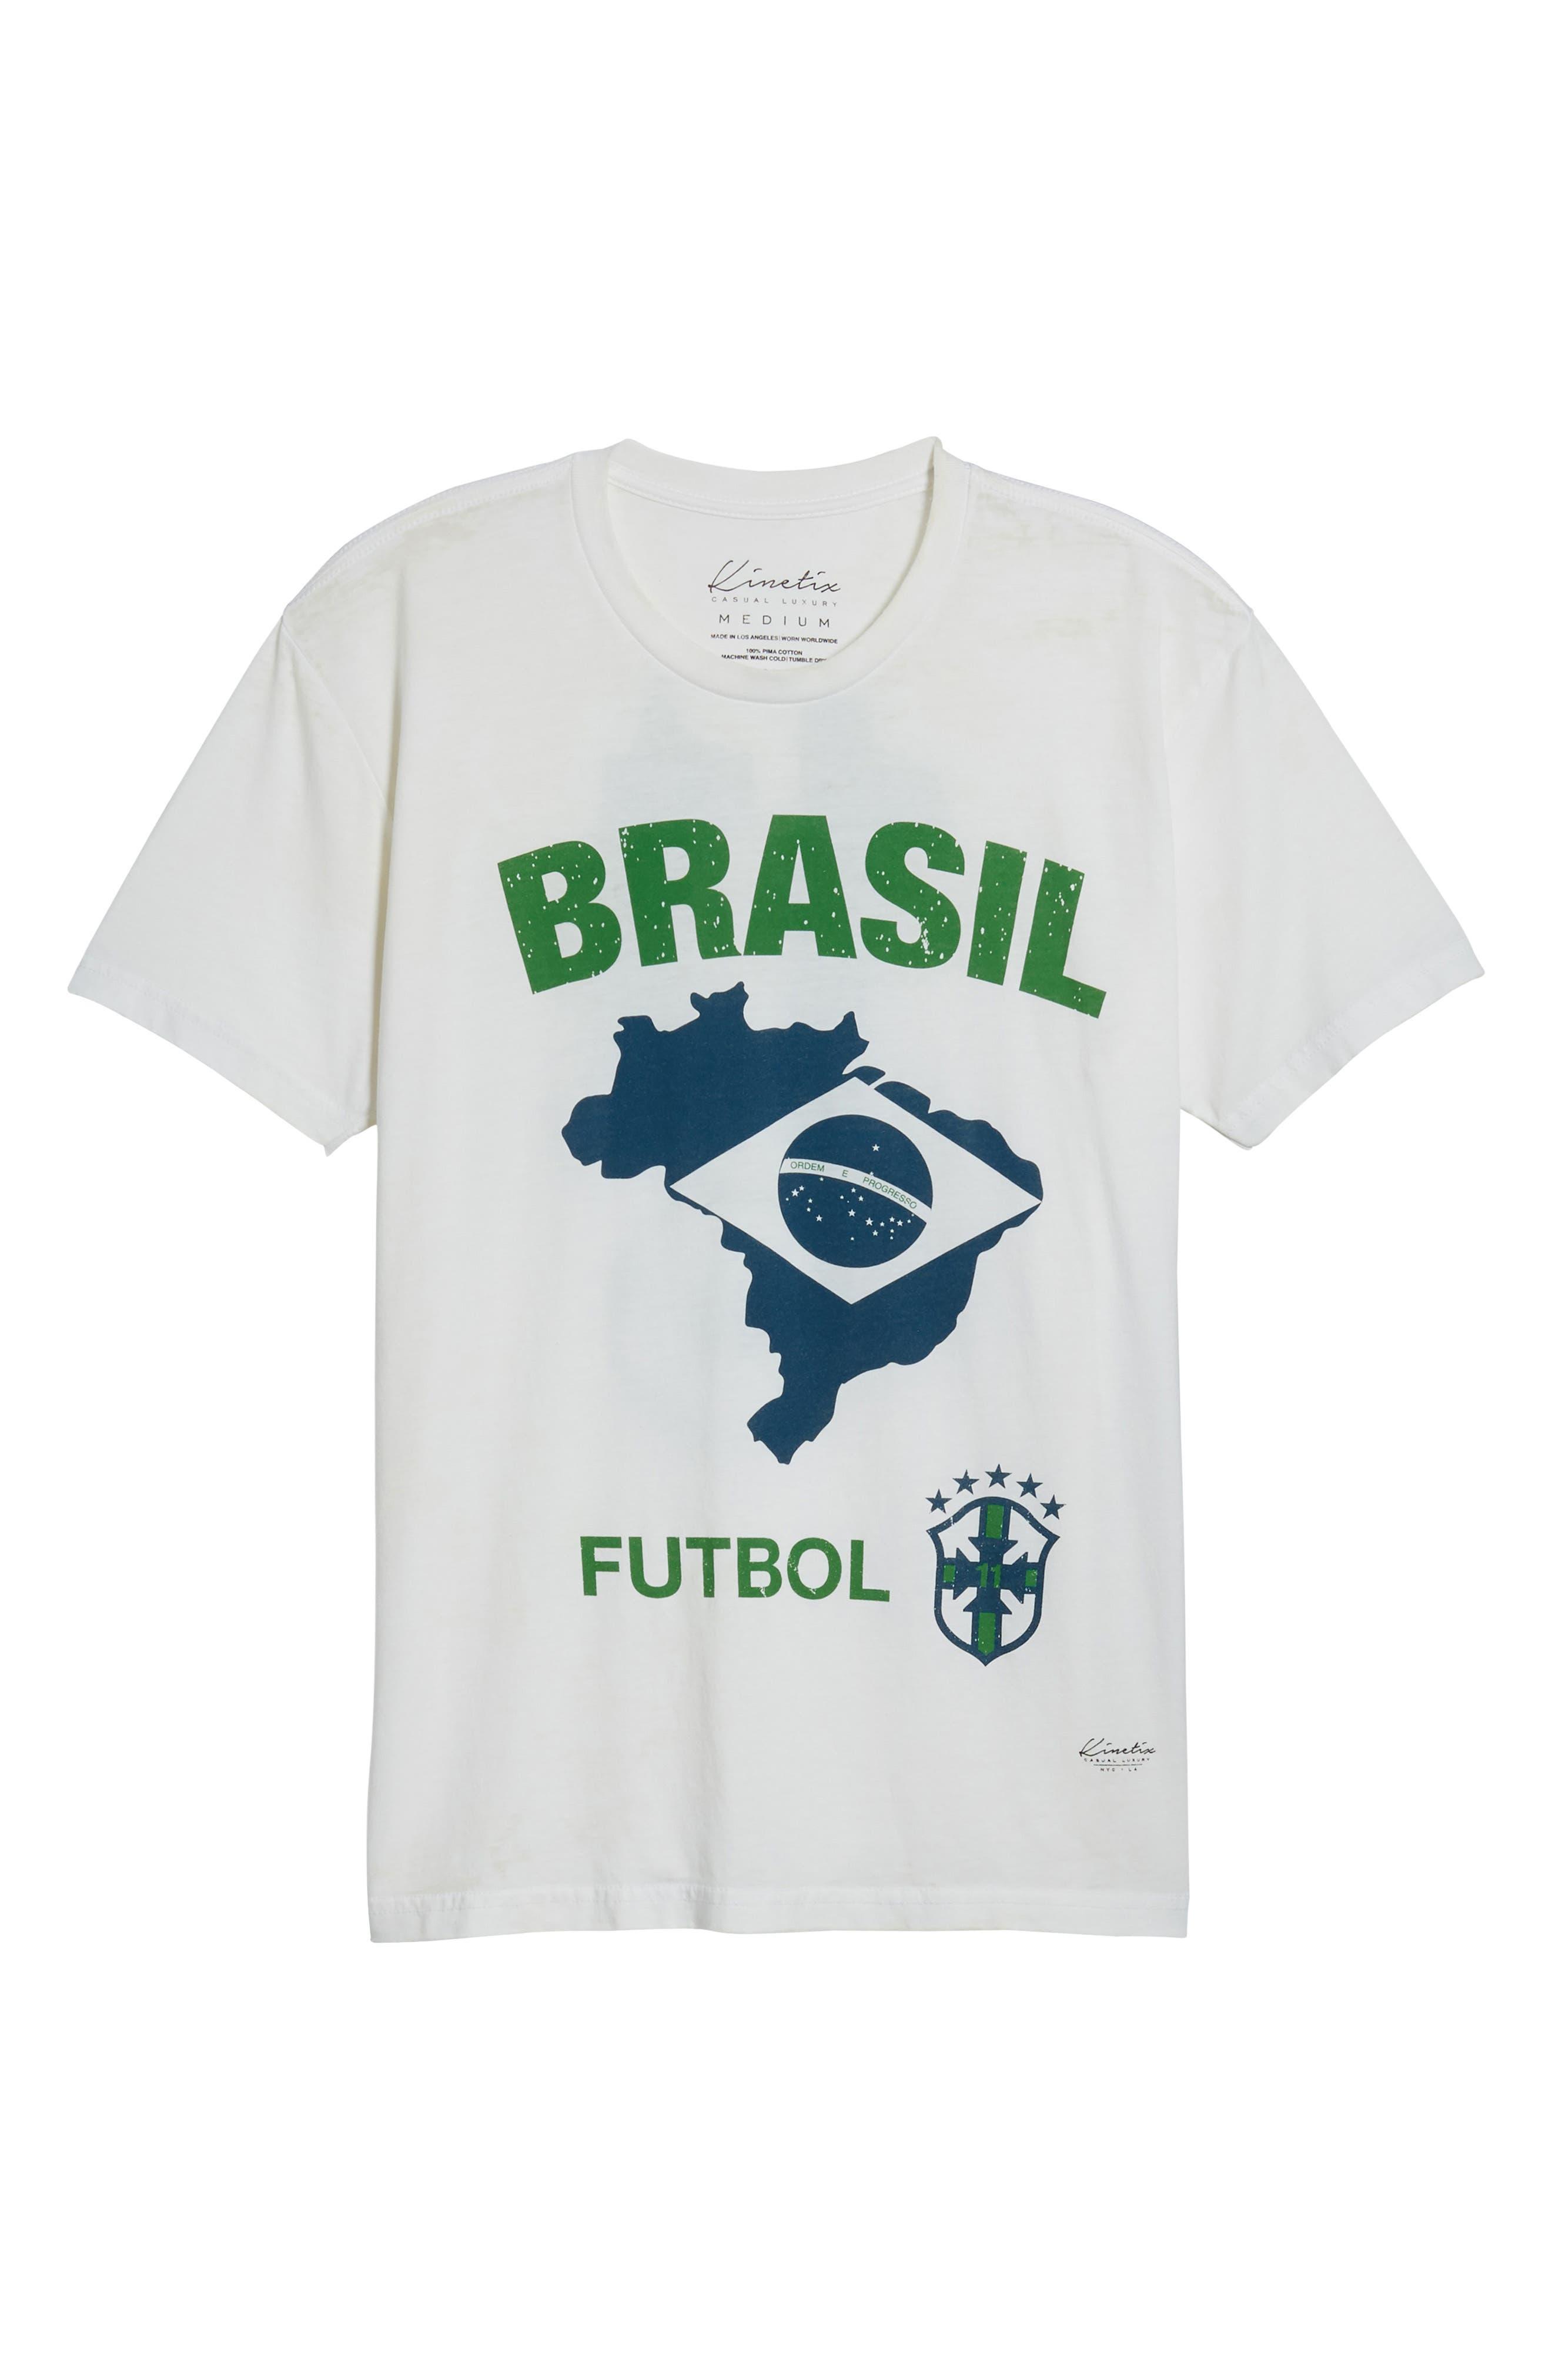 Brasil Futbol T-Shirt,                             Alternate thumbnail 6, color,                             White